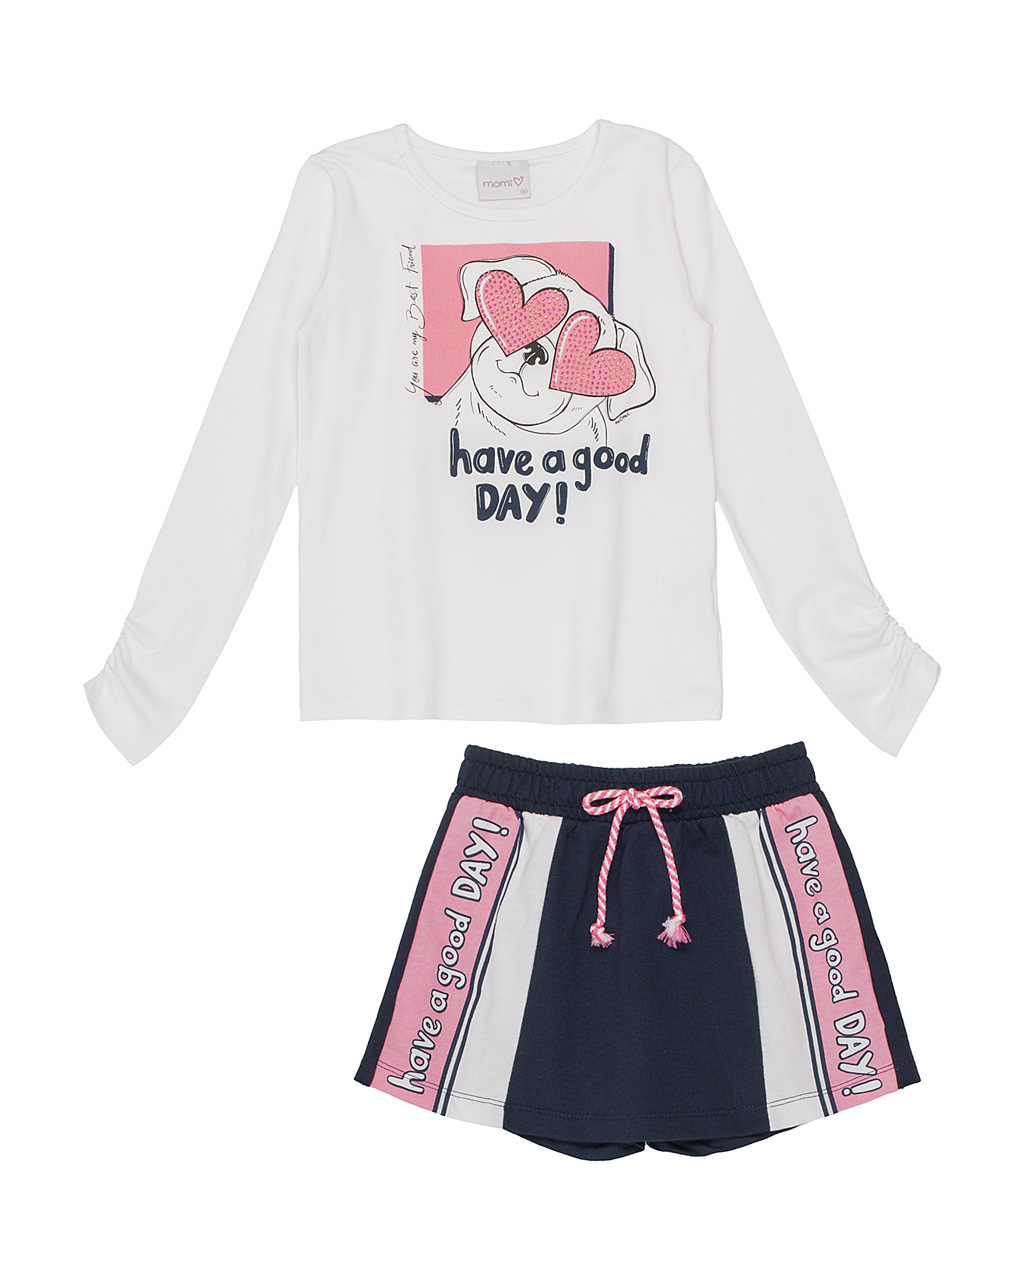 Conjunto Infantil Blusa Have a Good Day e Shorts Saia Marinho Momi